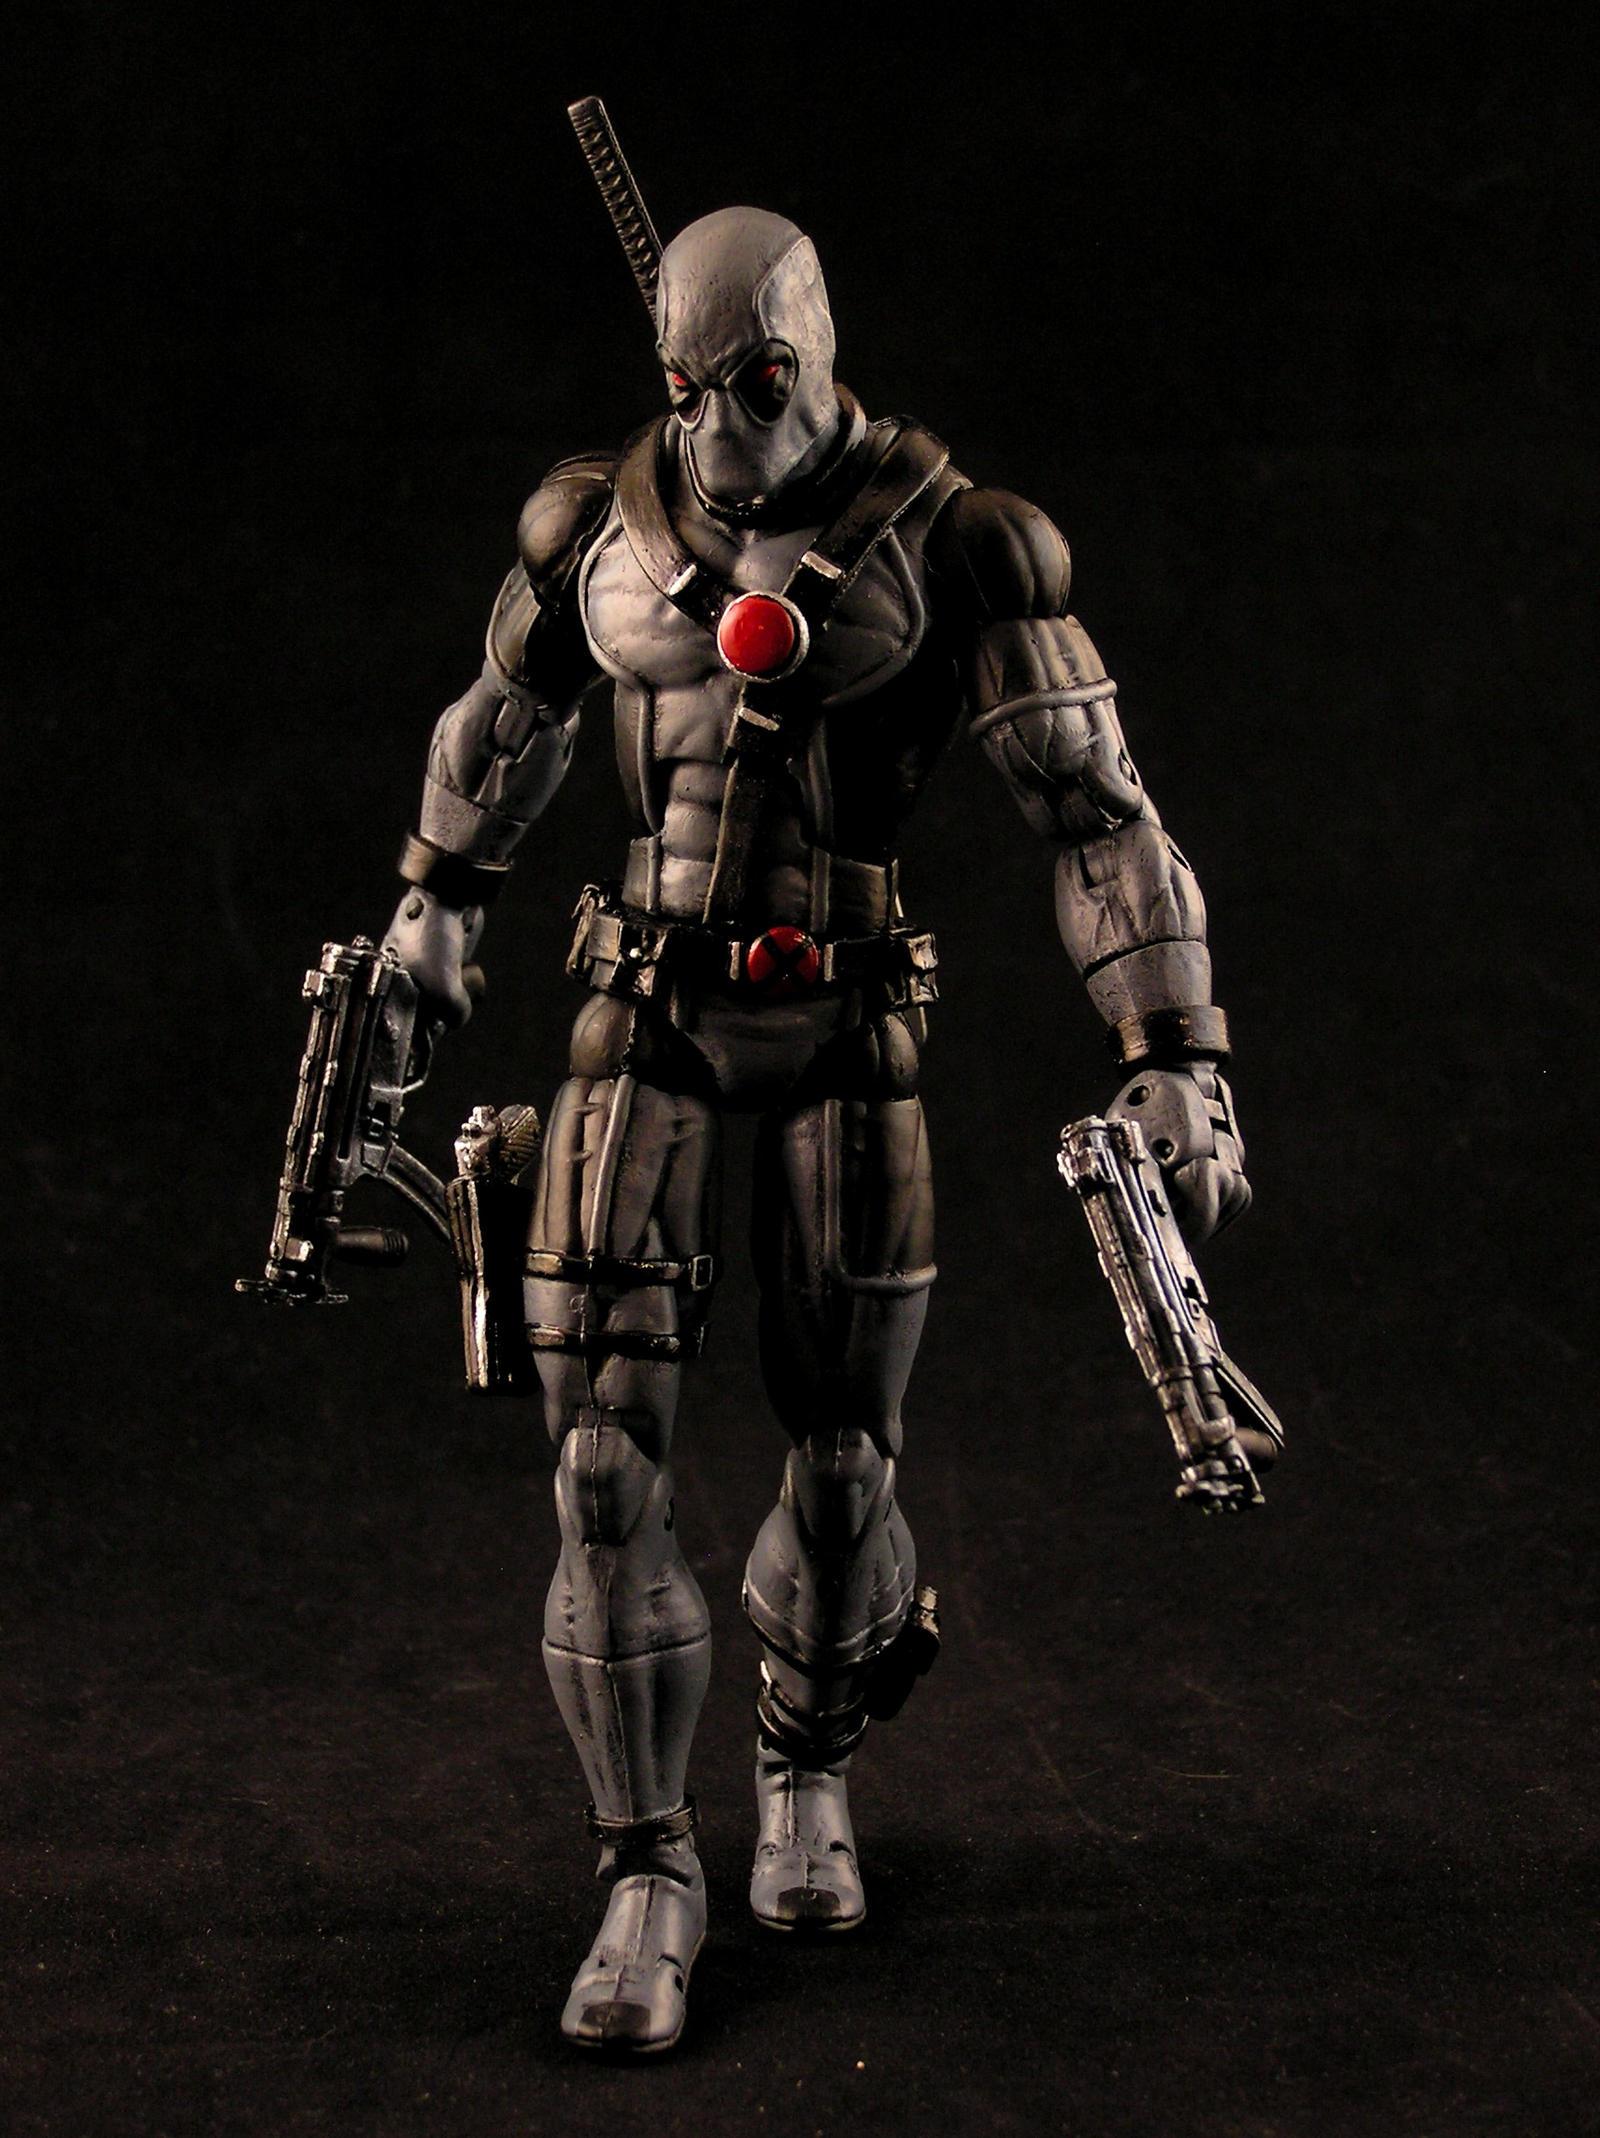 X Force Deadpool X-Force Deadpool x3 by...